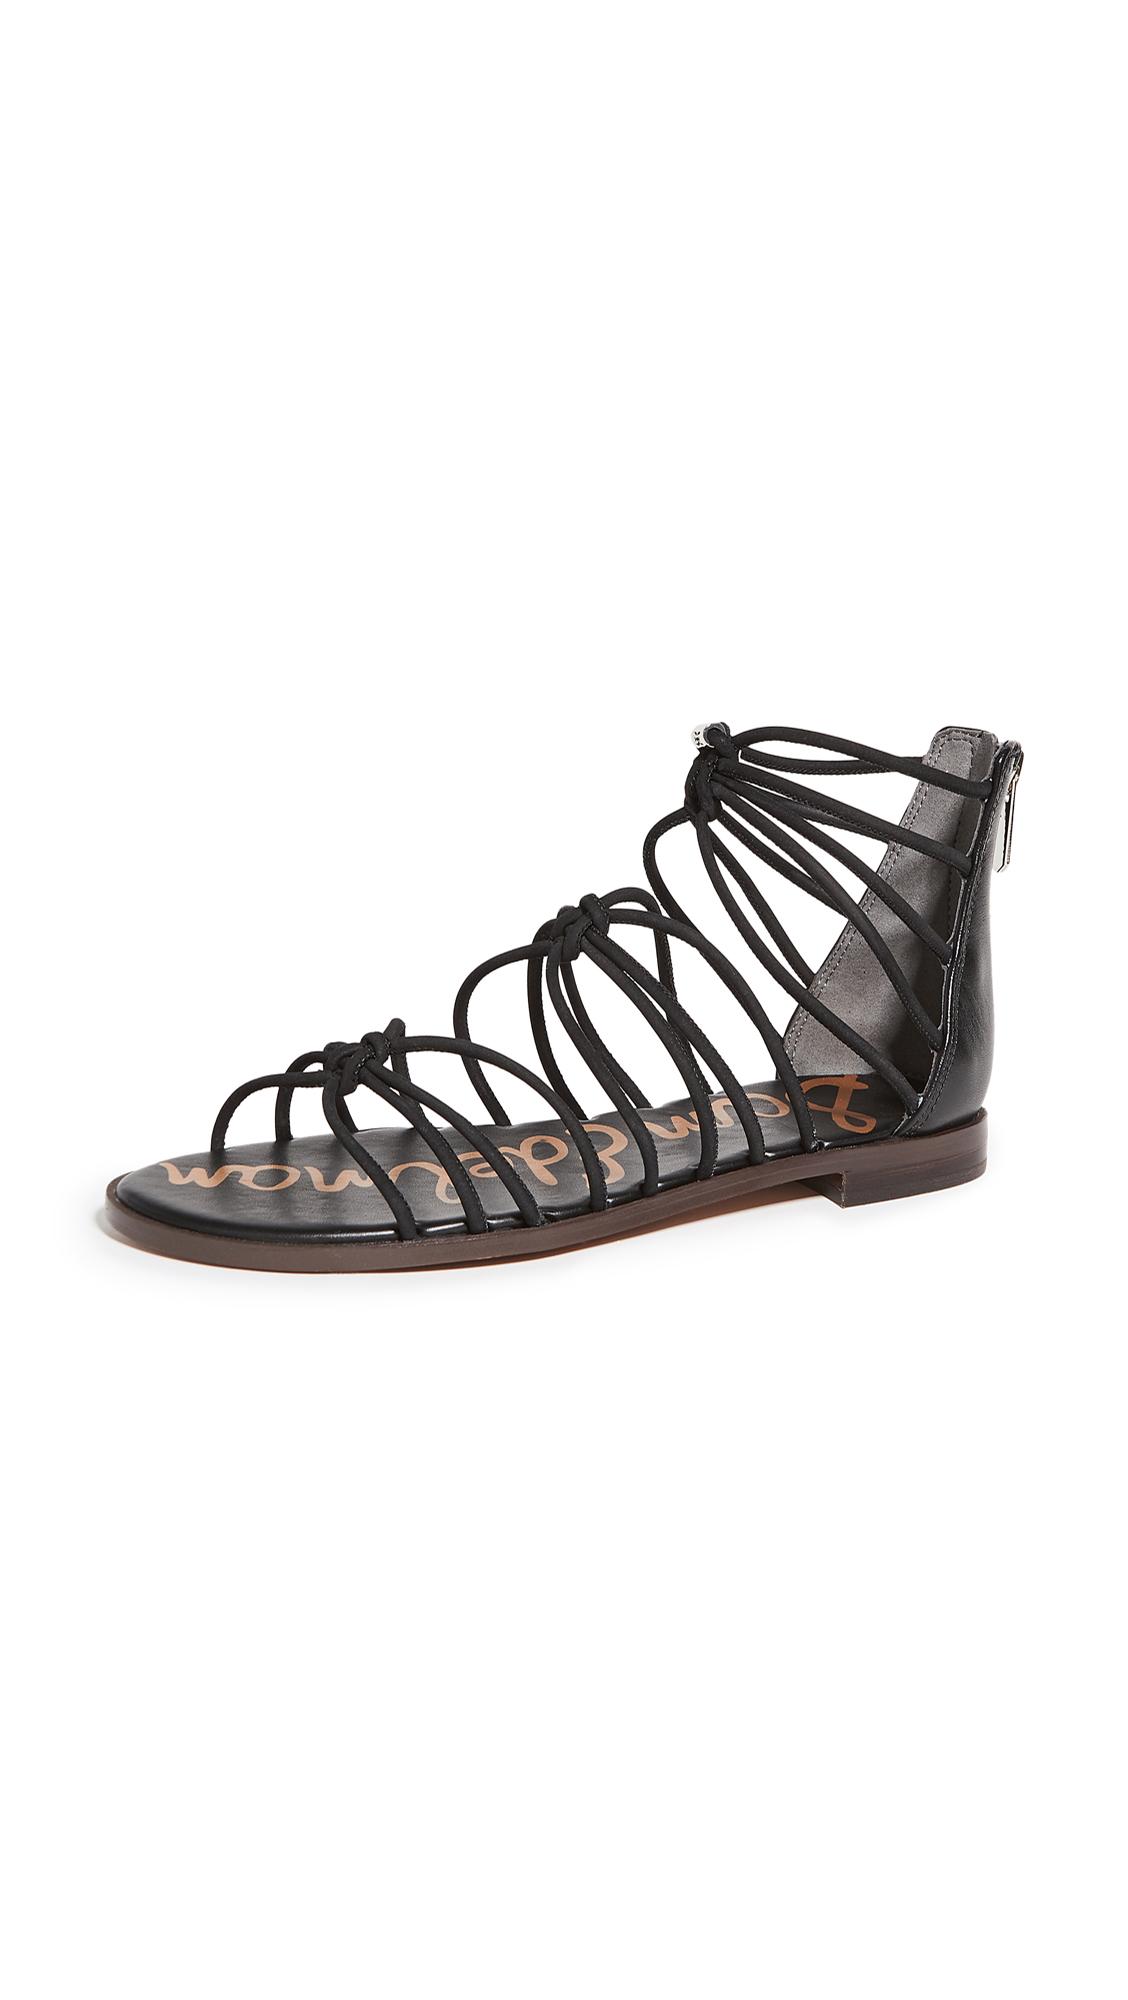 Buy Sam Edelman Emi Sandals online, shop Sam Edelman